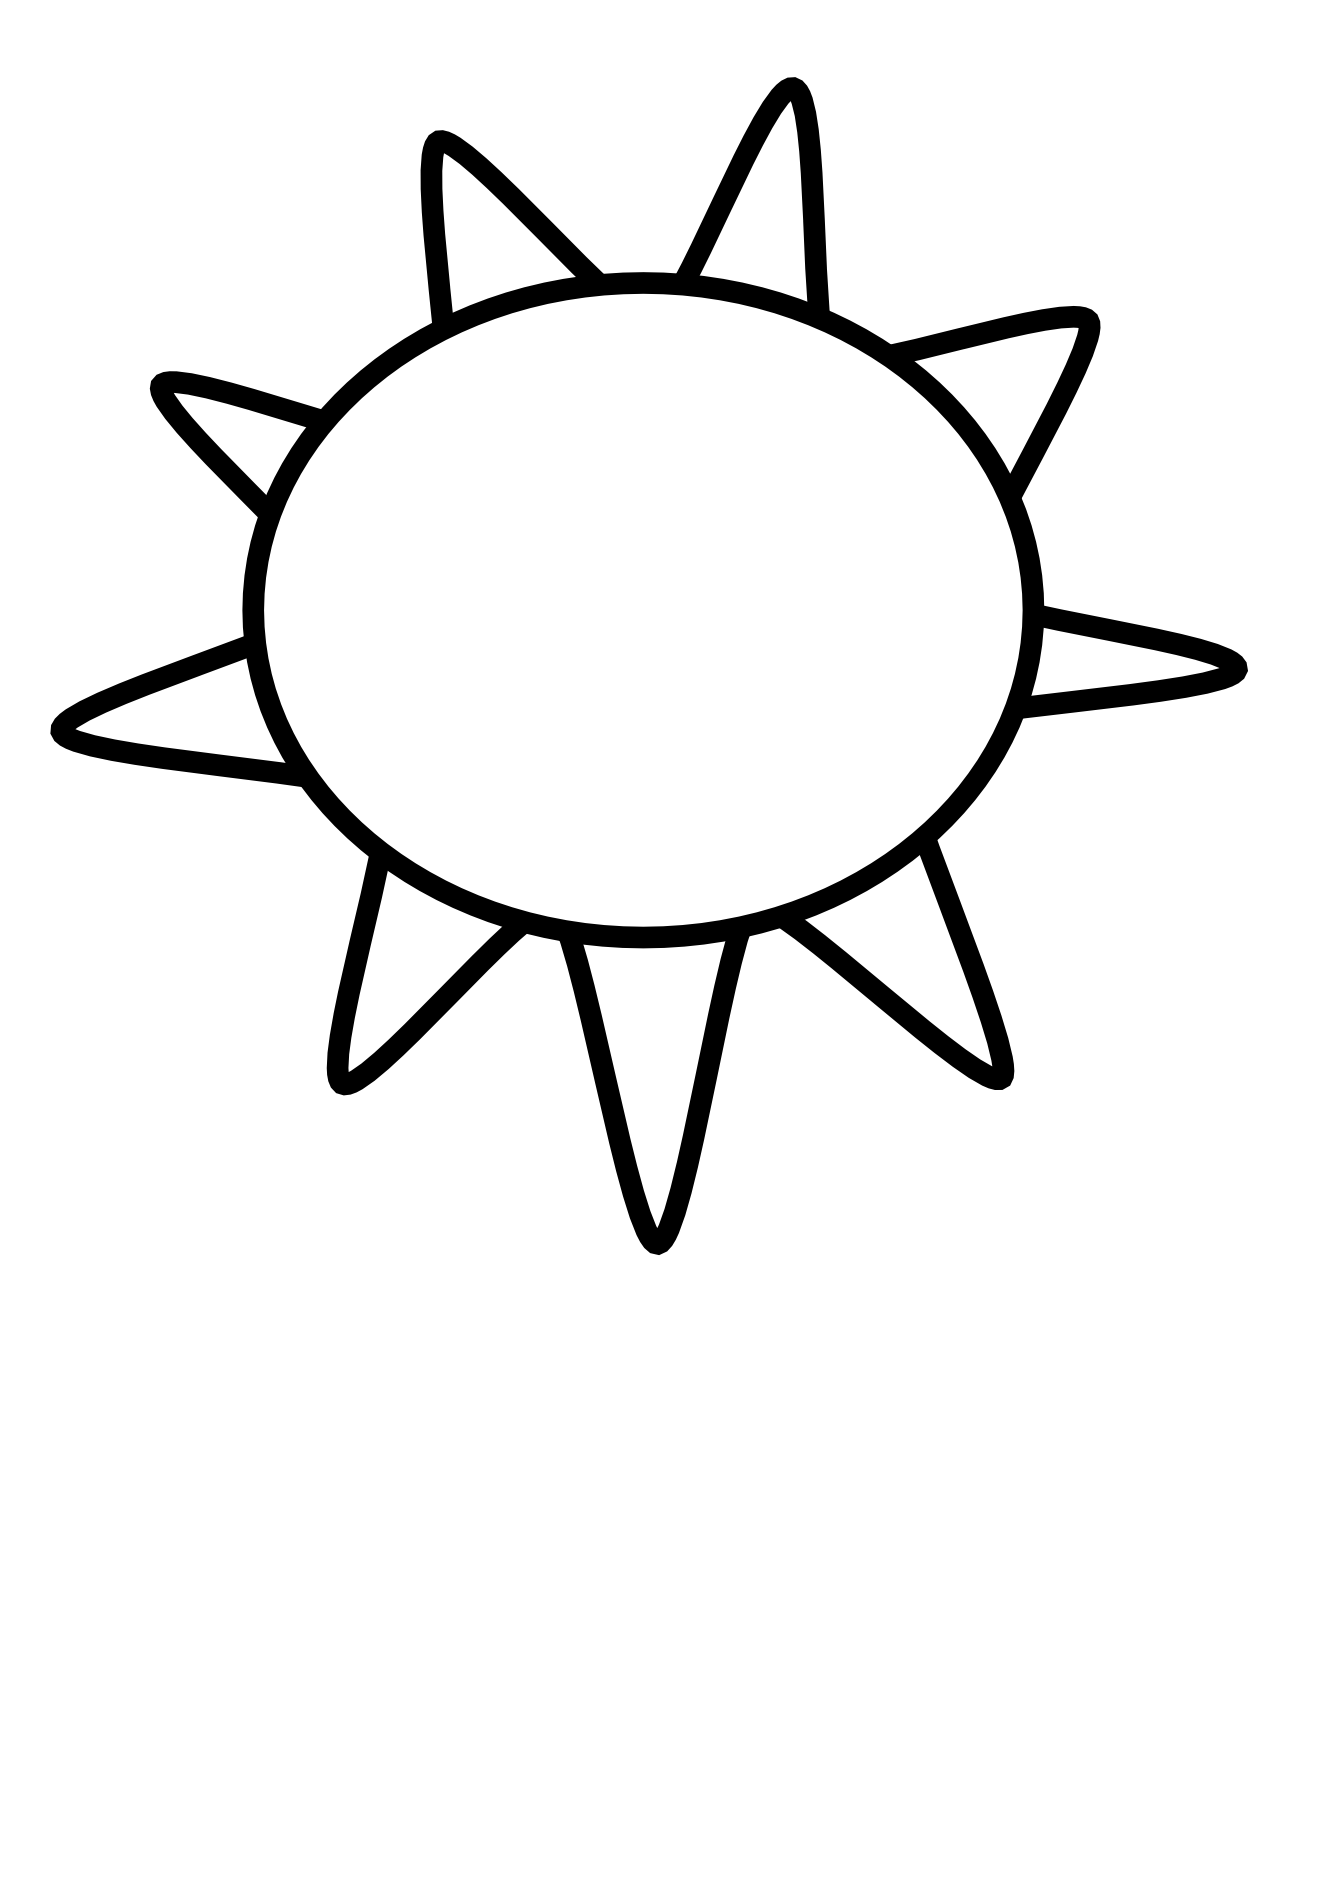 Dusk clipart matahari Half Free Clipart Clipart half%20sun%20clip%20art